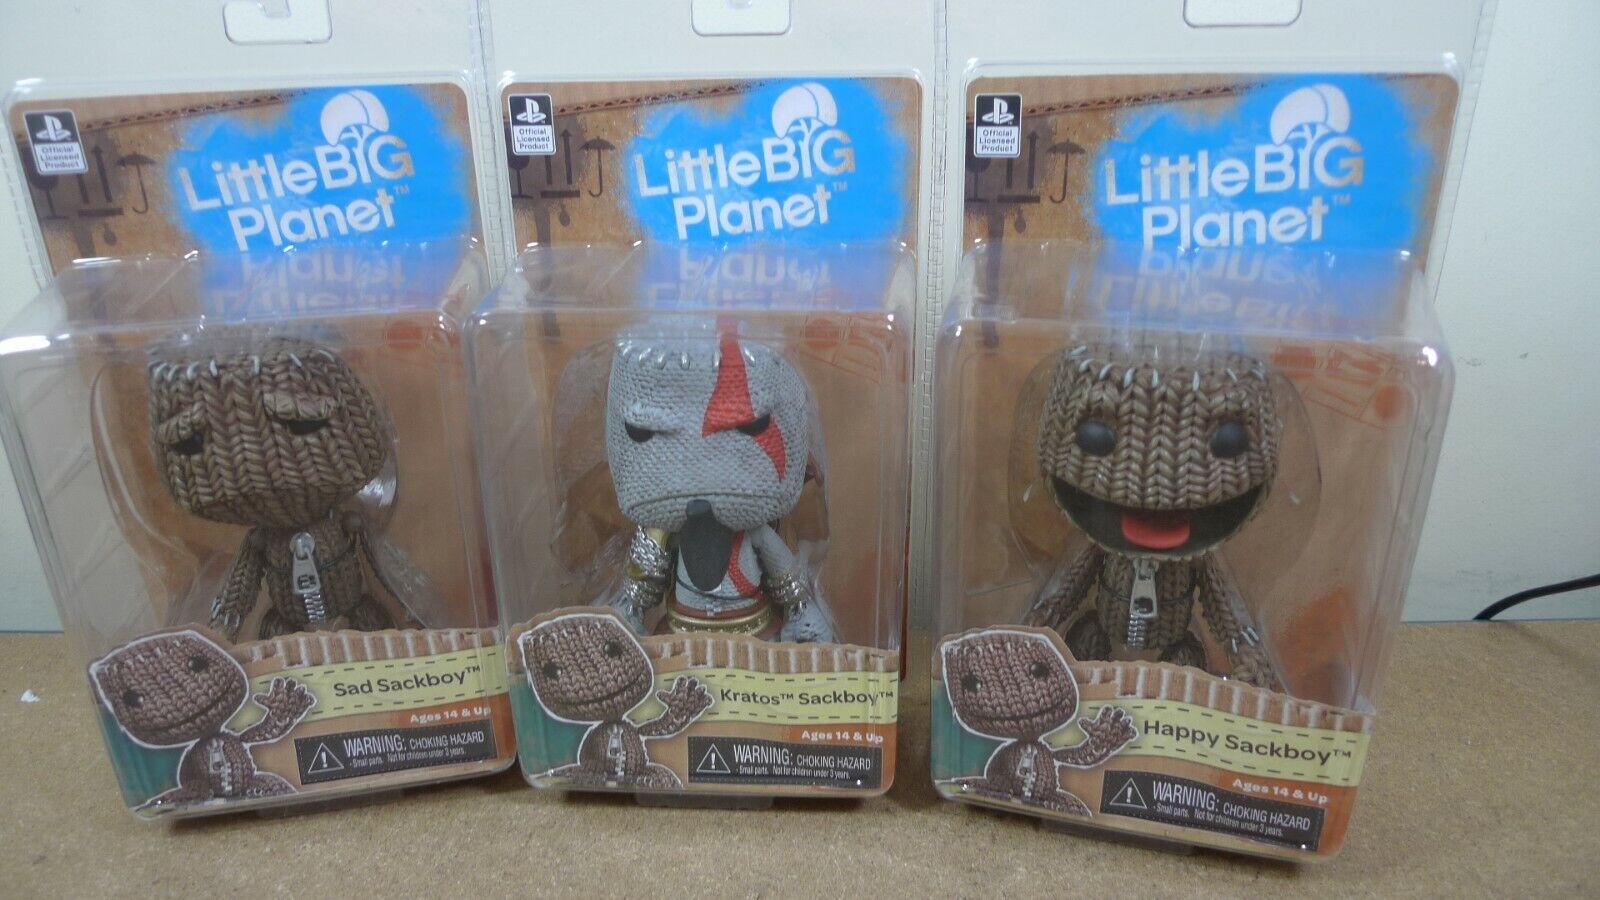 Neca Little Big Planet Series 1 Set Completo feliz, triste & Kratos Sackboy figuras